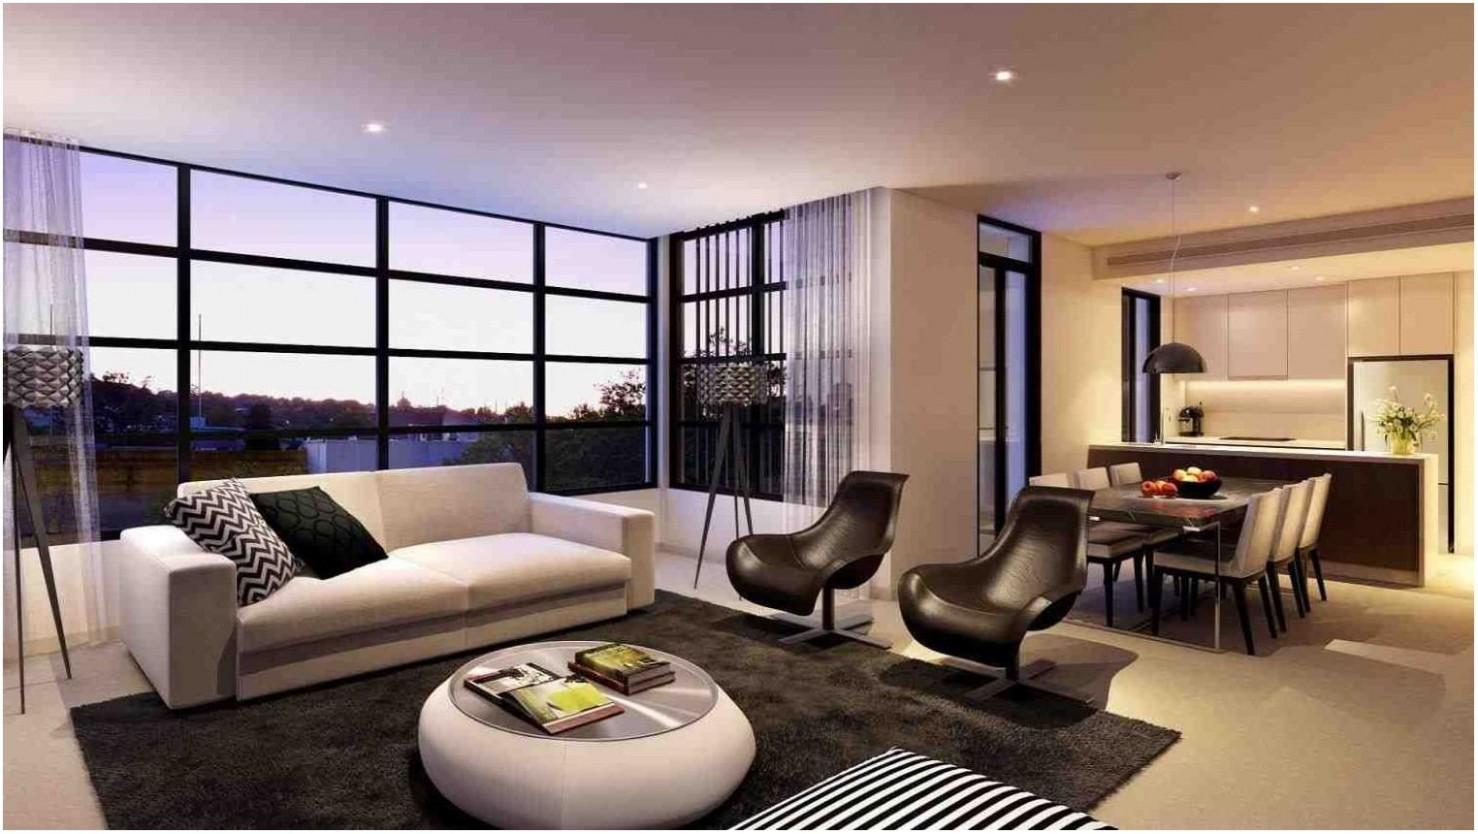 Bathroom Interior Design Hd Living Room  Apartment interior  - Apartment Design Hd